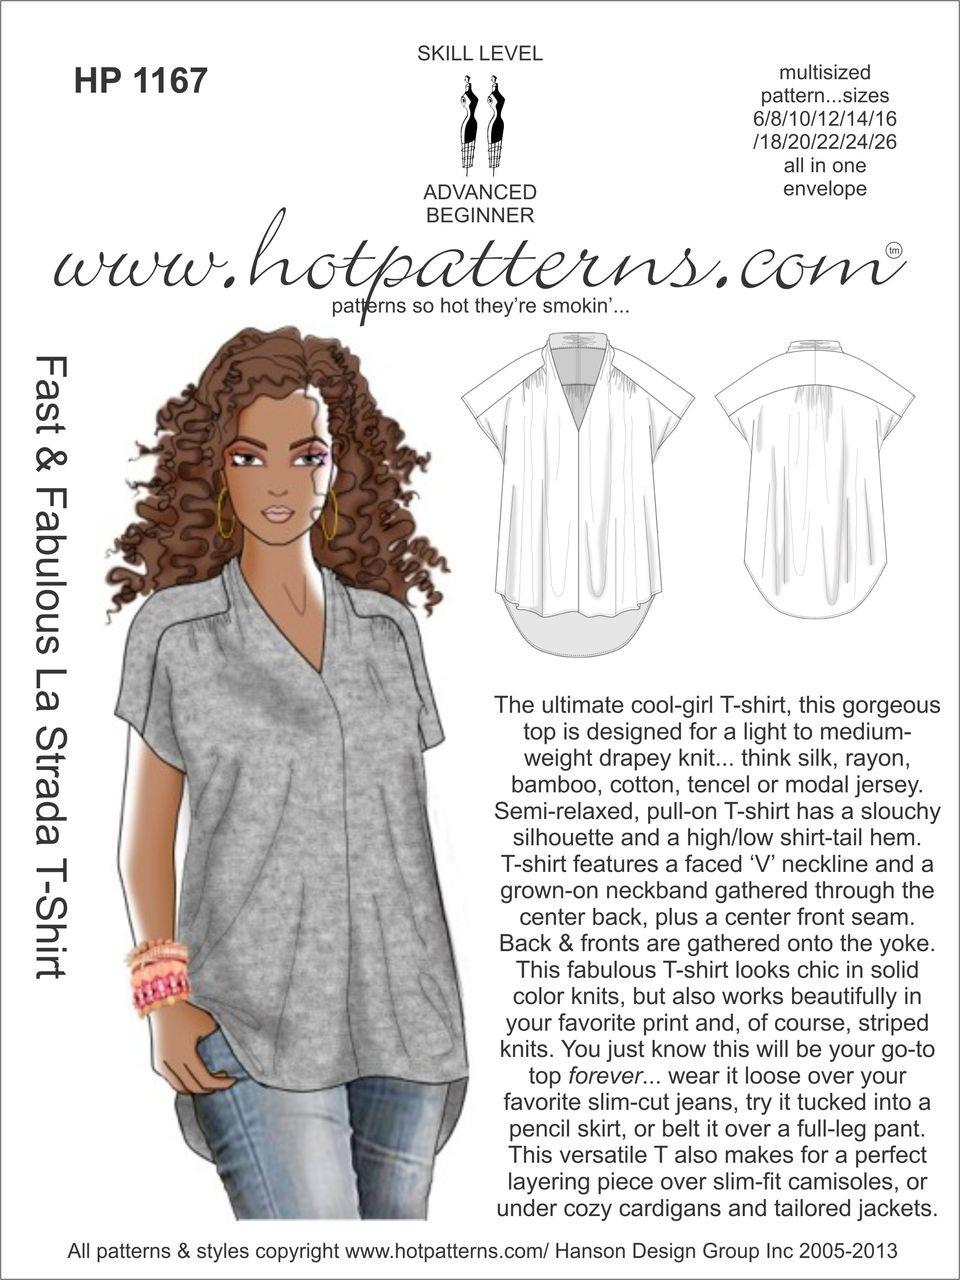 HP 1167 Fast & Fabulous La Strada T-Shirt